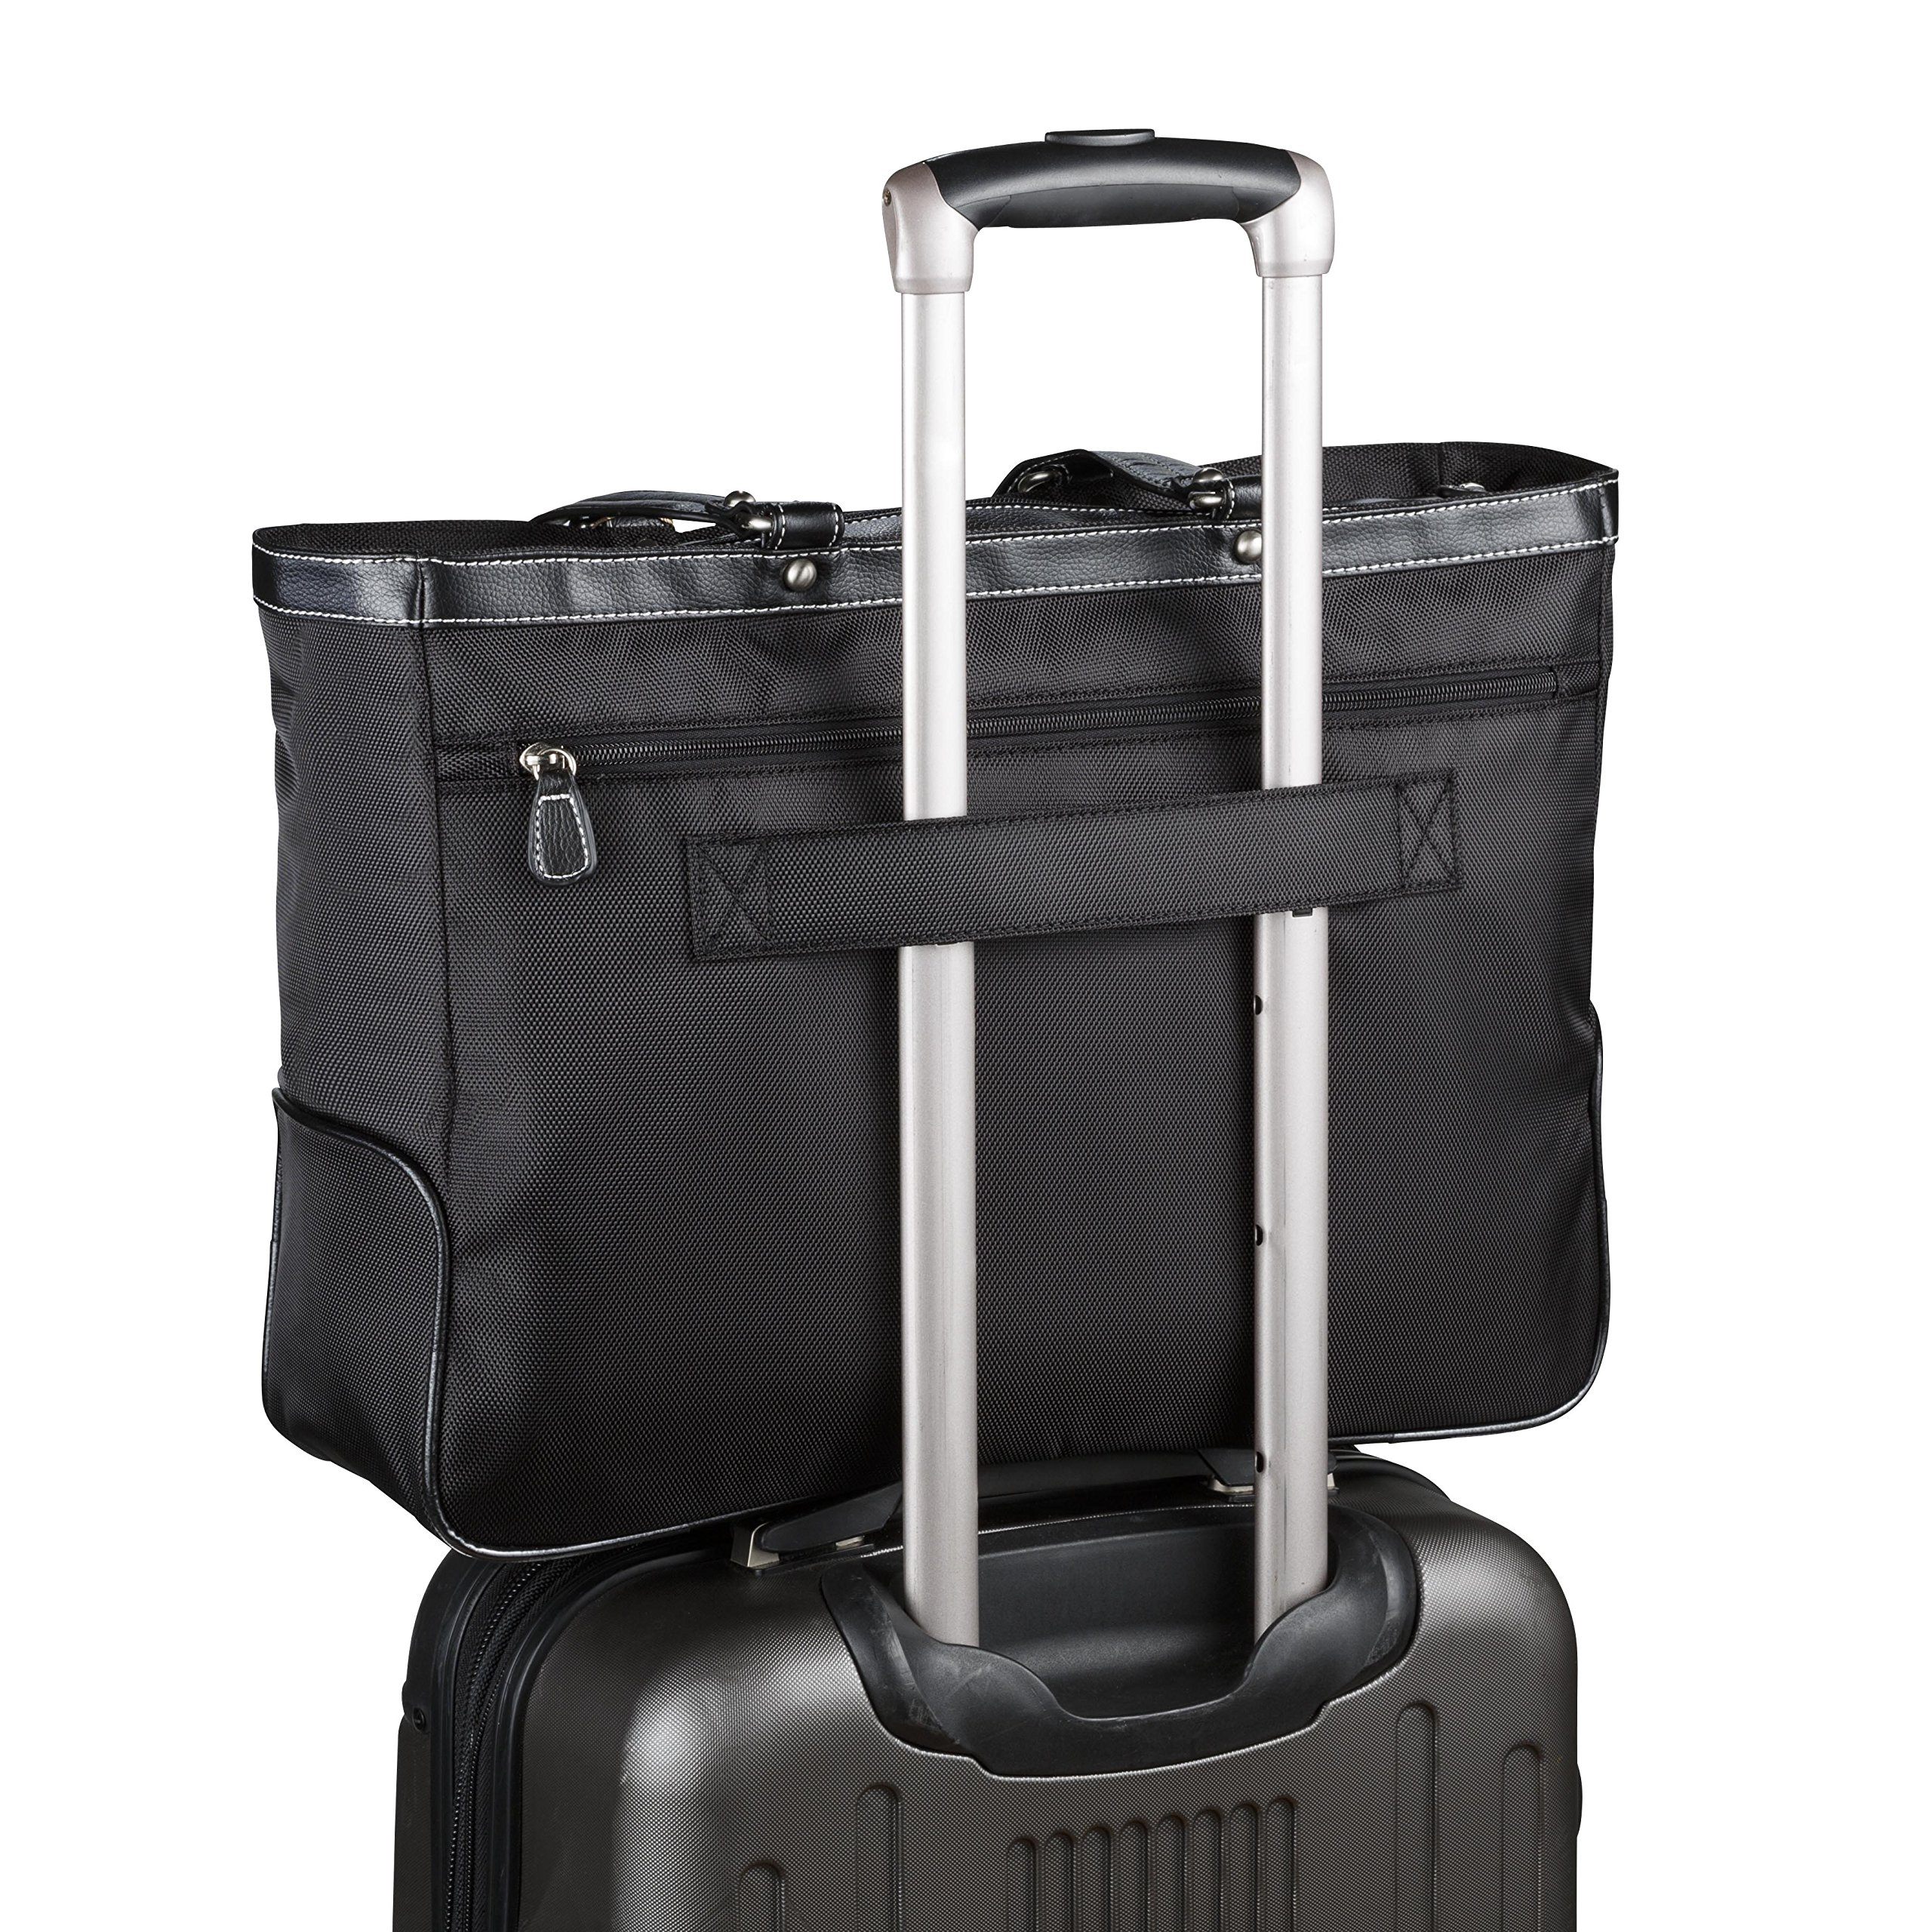 Clark & Mayfield Marquam Laptop Handbag 18.4'' (Black)